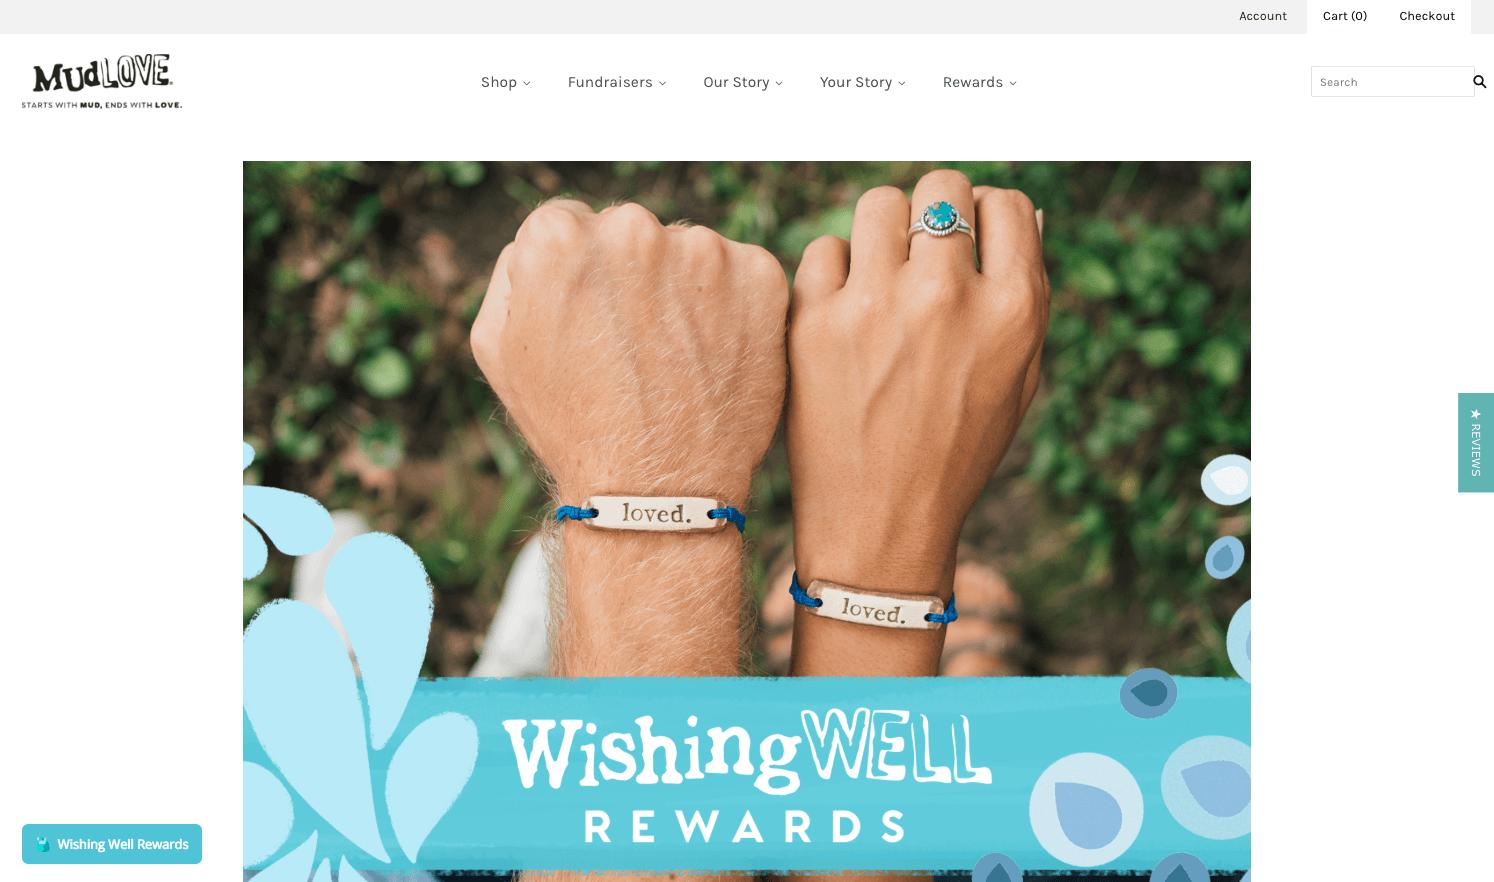 The Best eCommerce Loyalty Programs - Mudlove Wishing Well Rewards